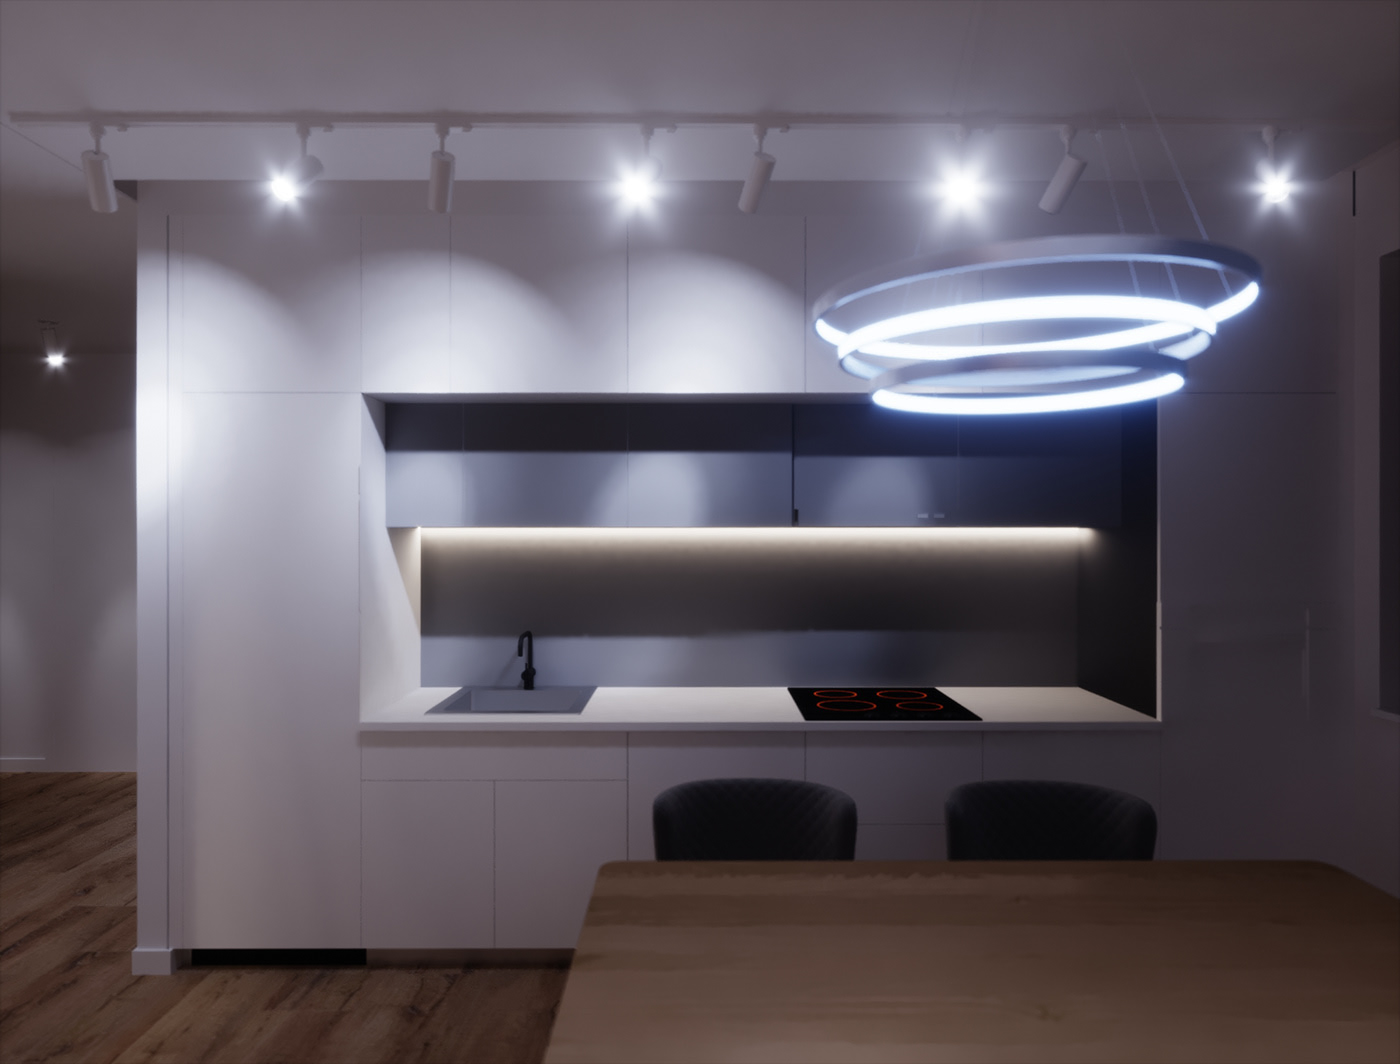 Apartment Interior Kitchenroom